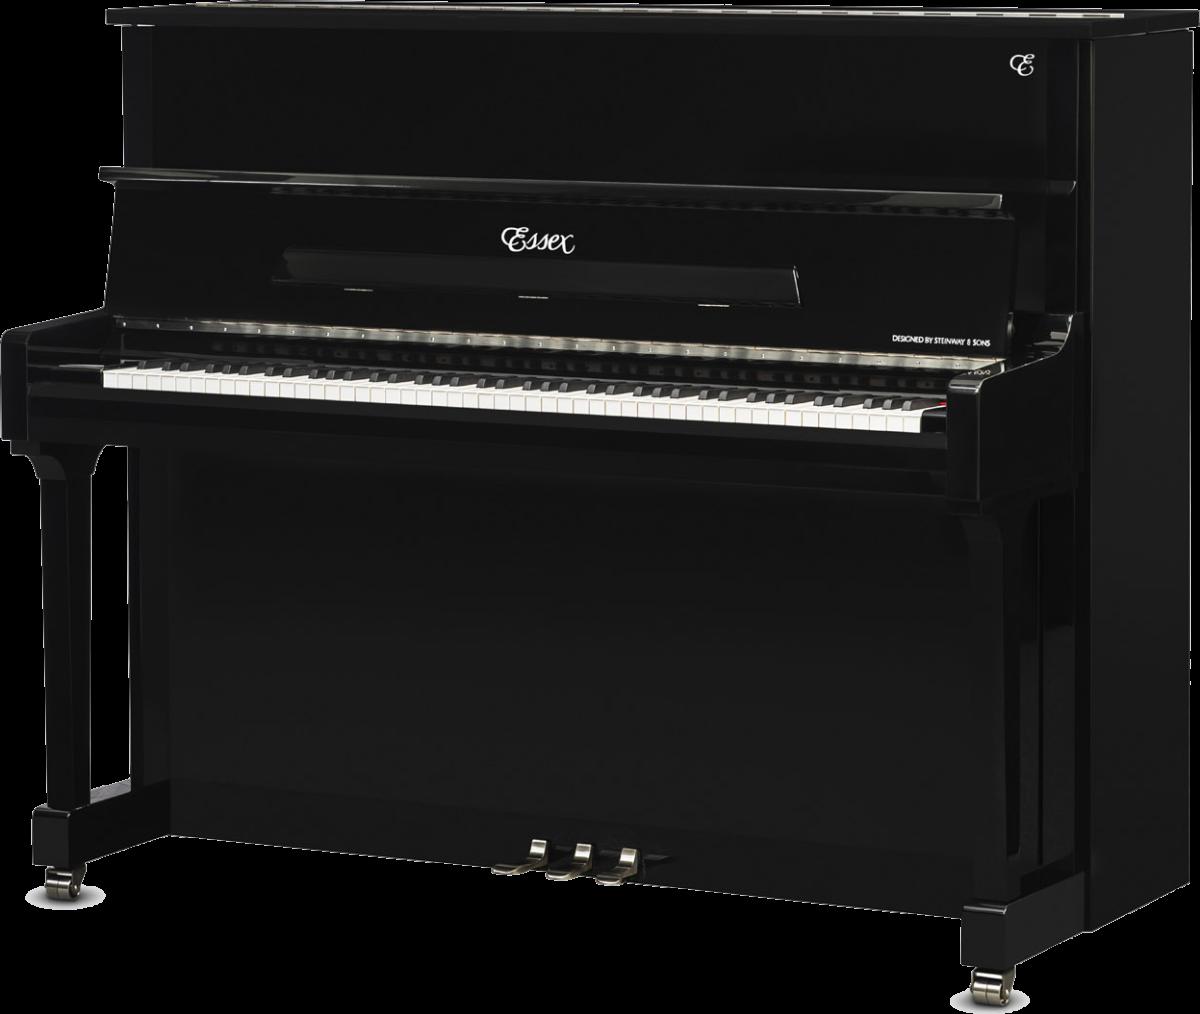 piano-vertical-essex-eup123-chrome-nuevo-negro-plata-frontal